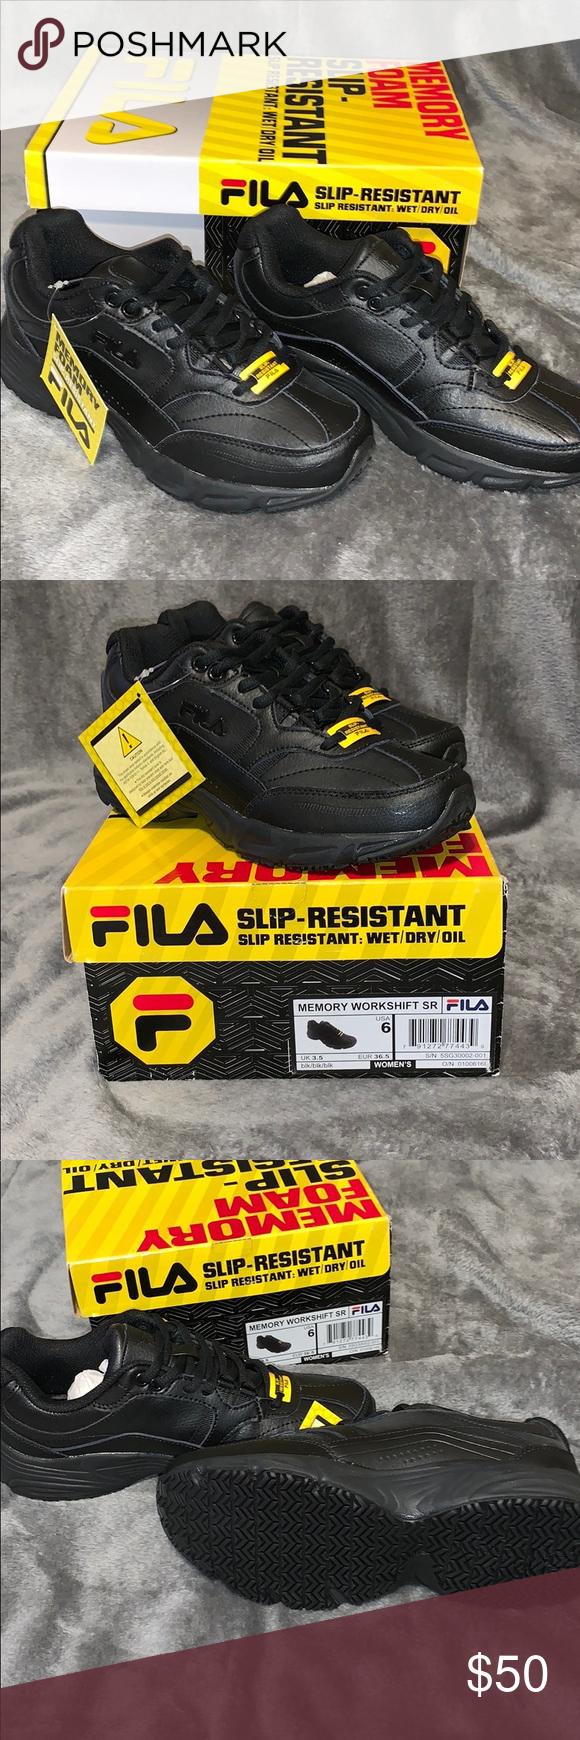 6eaec685e3 NWT Fila Non- Slip Work Shoes Never worn Fila Non- Slip Work Shoes ...